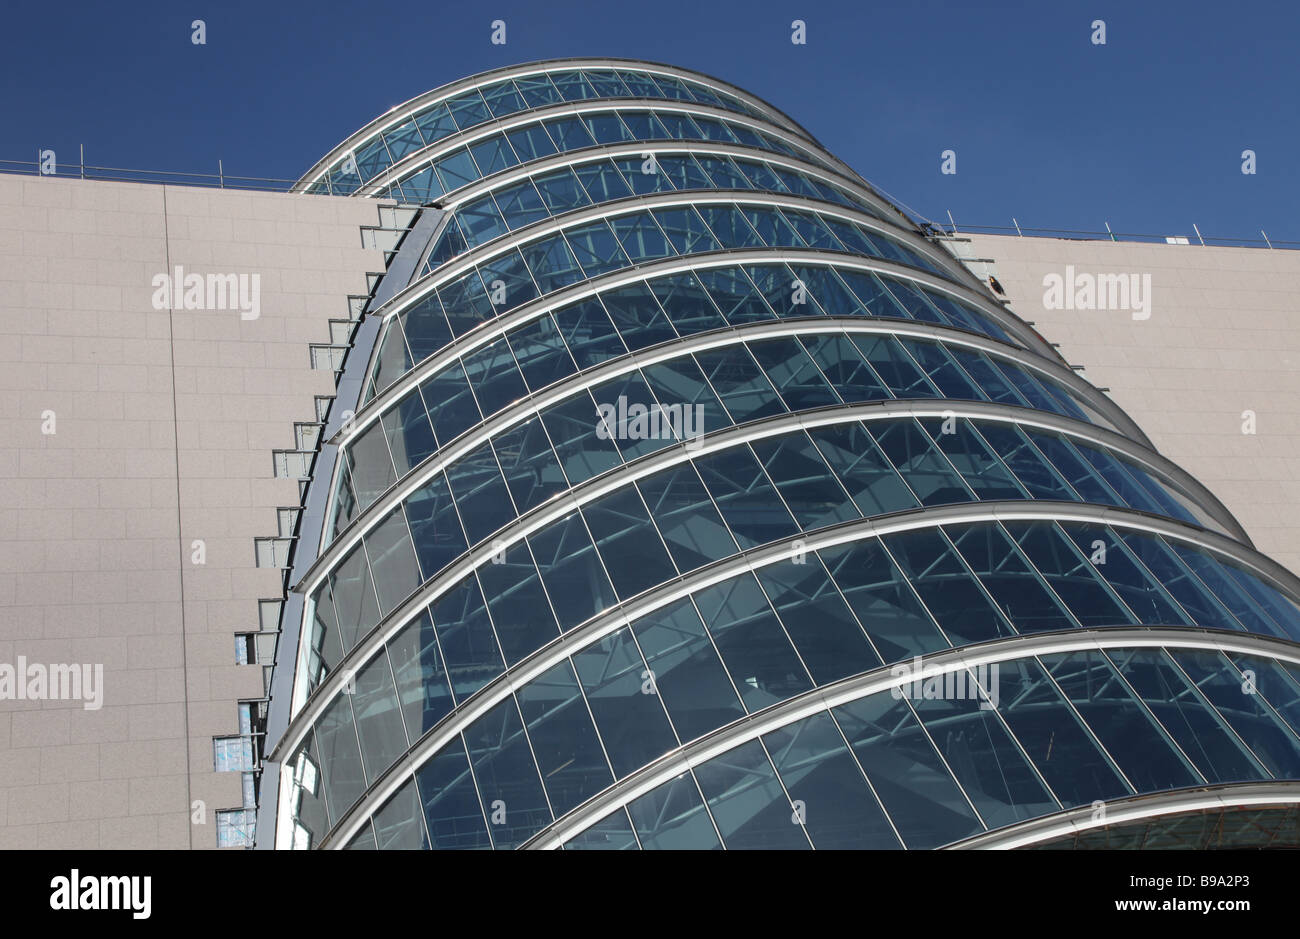 National Conference Centre Dublin Docklands Dublin Ireland - Stock Image